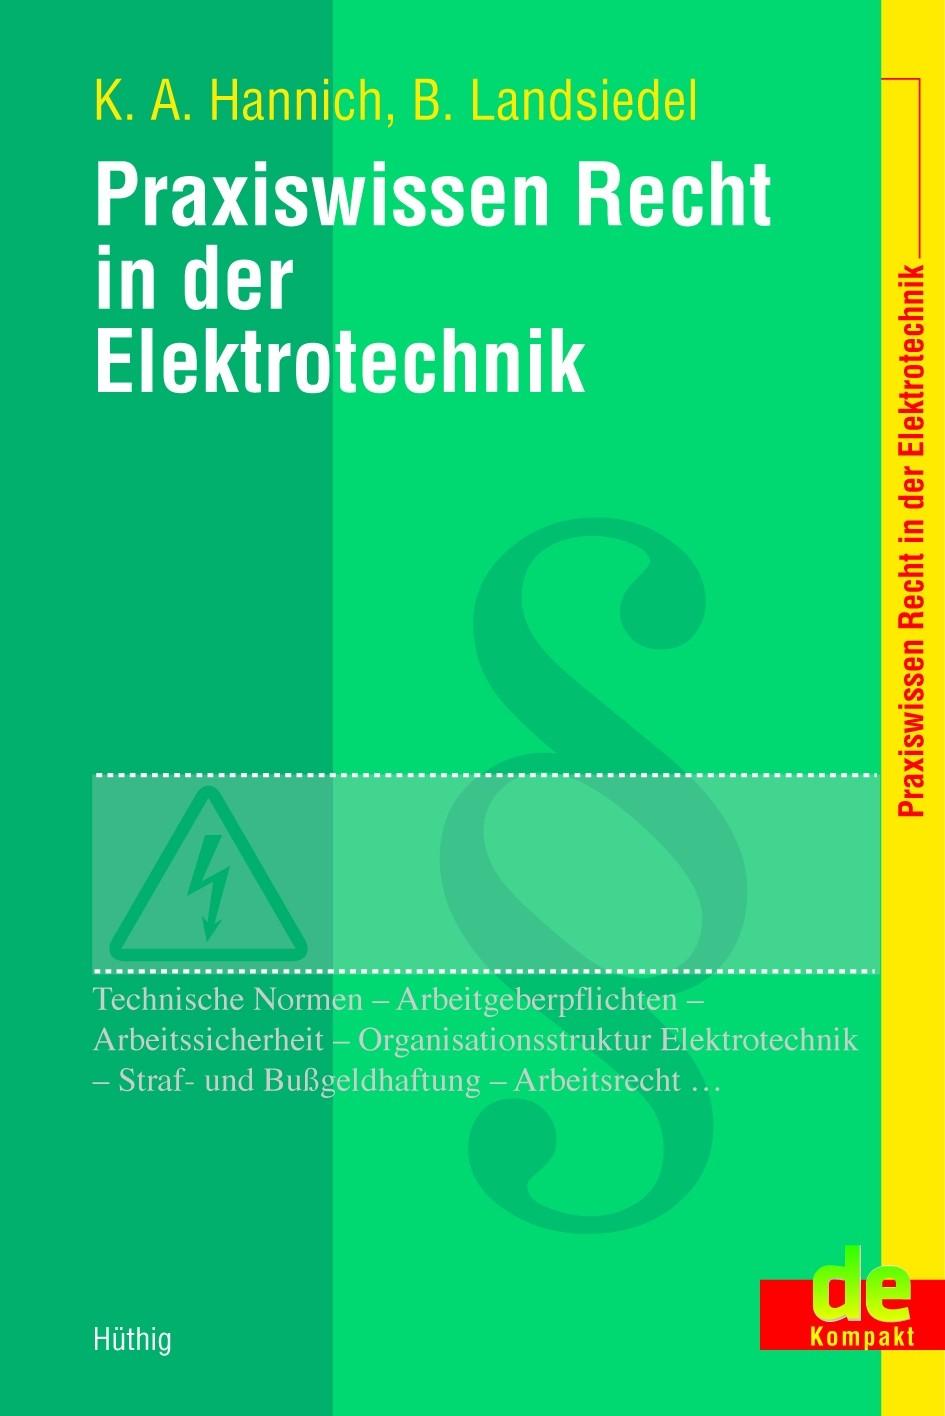 Praxiswissen Recht in der Elektrotechnik